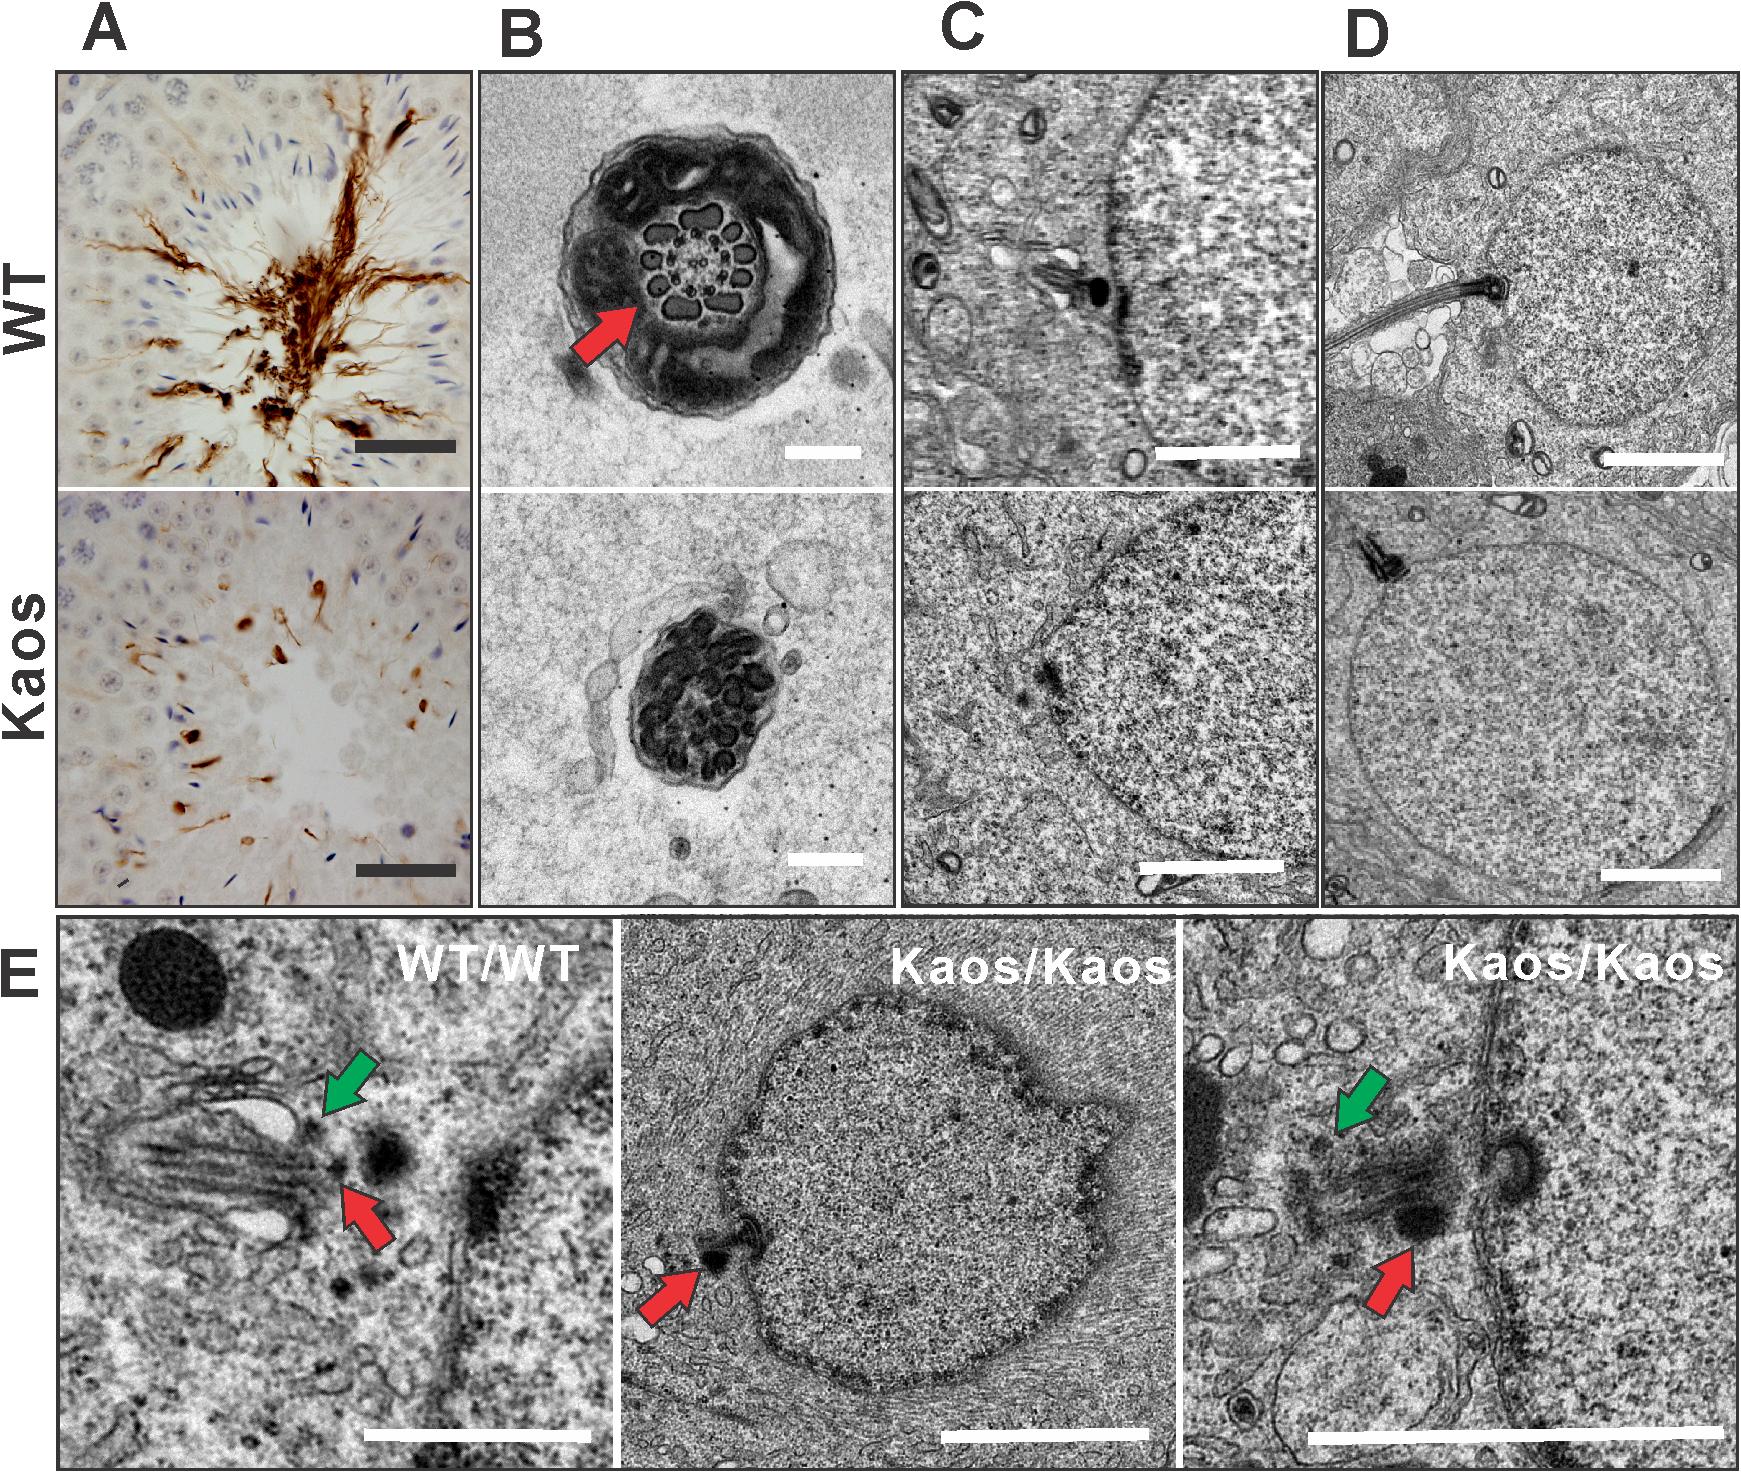 Axoneme defects in <i>Lrguk</i><sup><i>Kaos/Kaos</i></sup> mice.